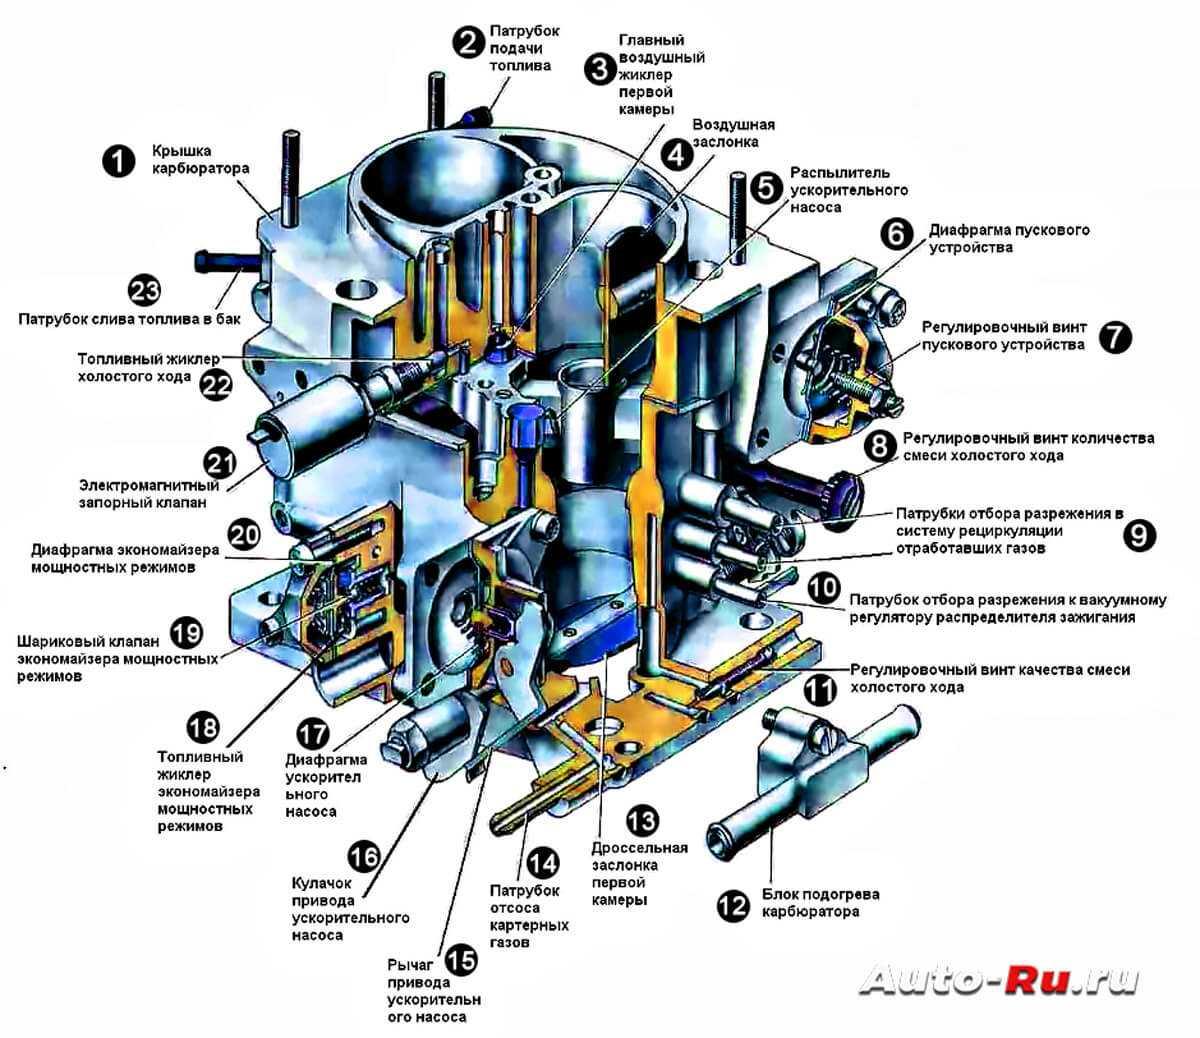 Схема карбюратора 2108, 21081, 21083 солекс   twokarburators.ru